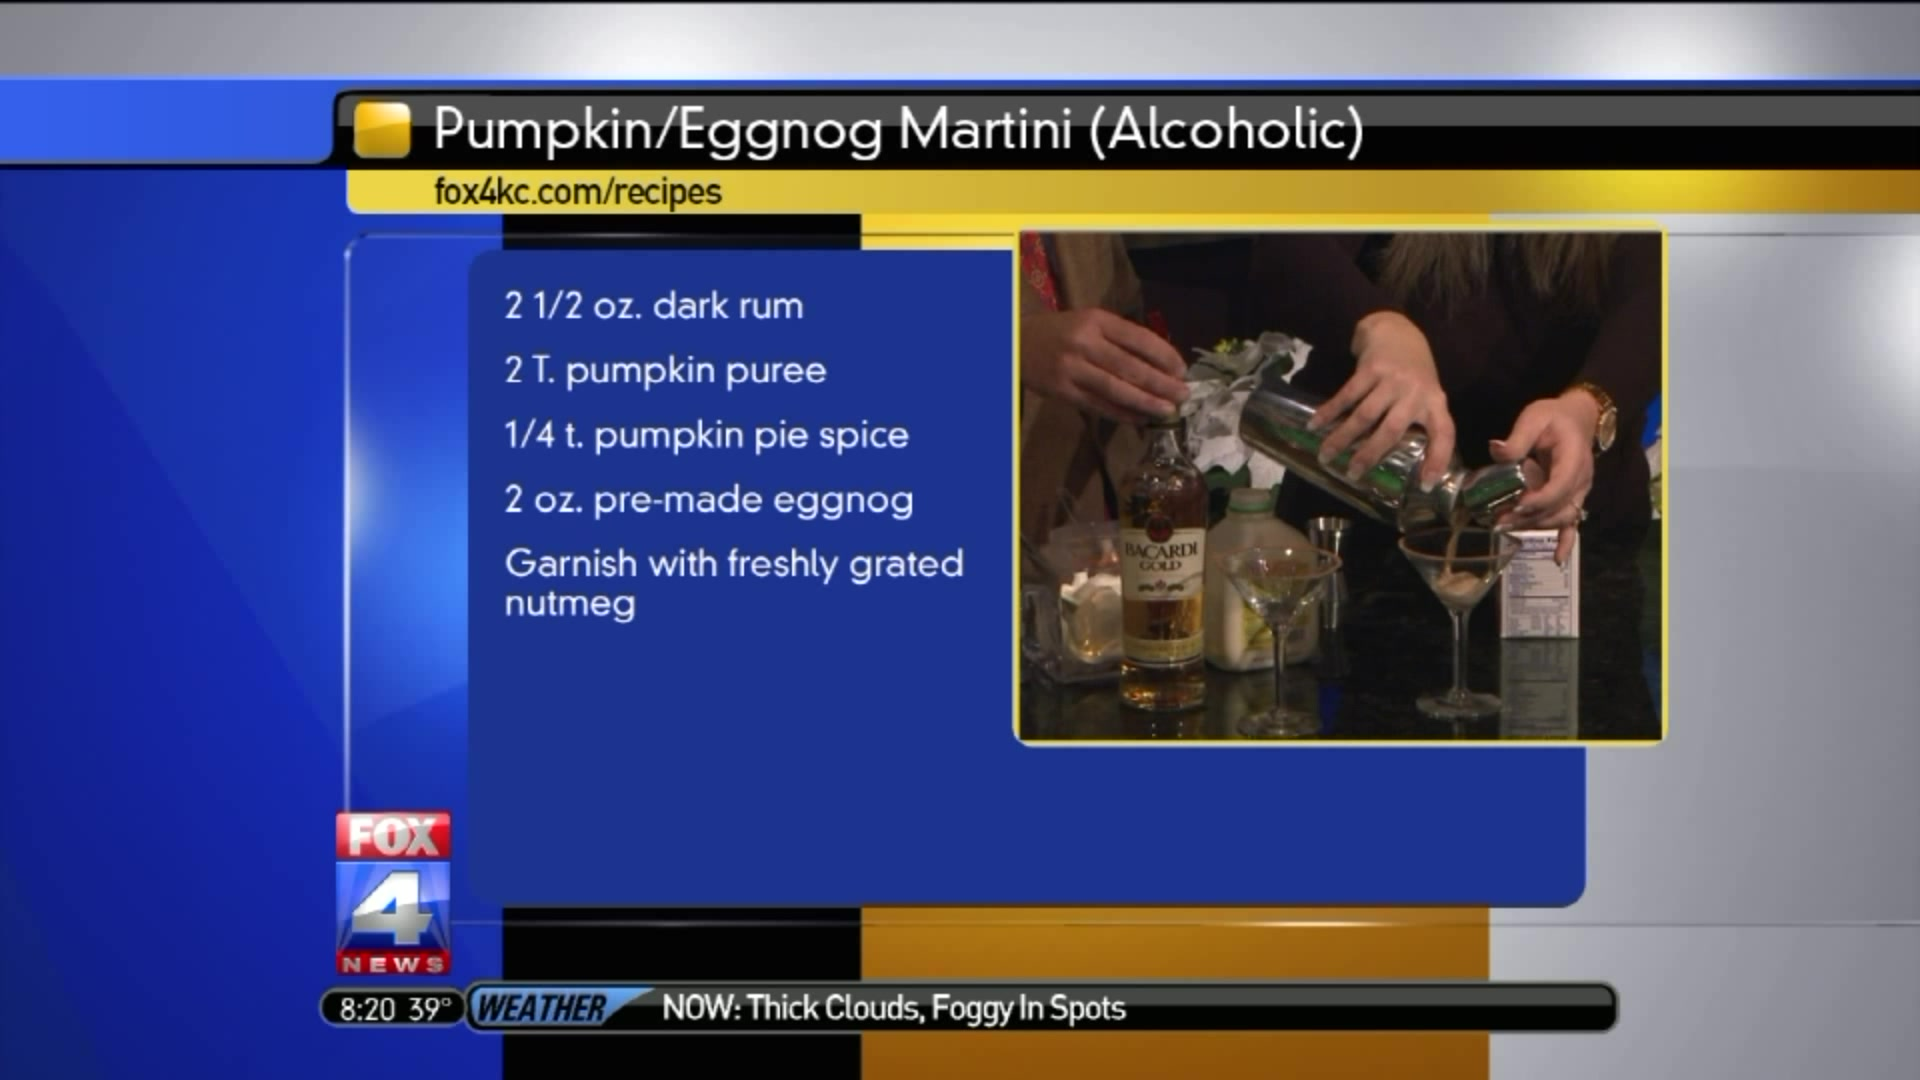 Holiday Cocktails: How To Make Pumpkin Eggnog